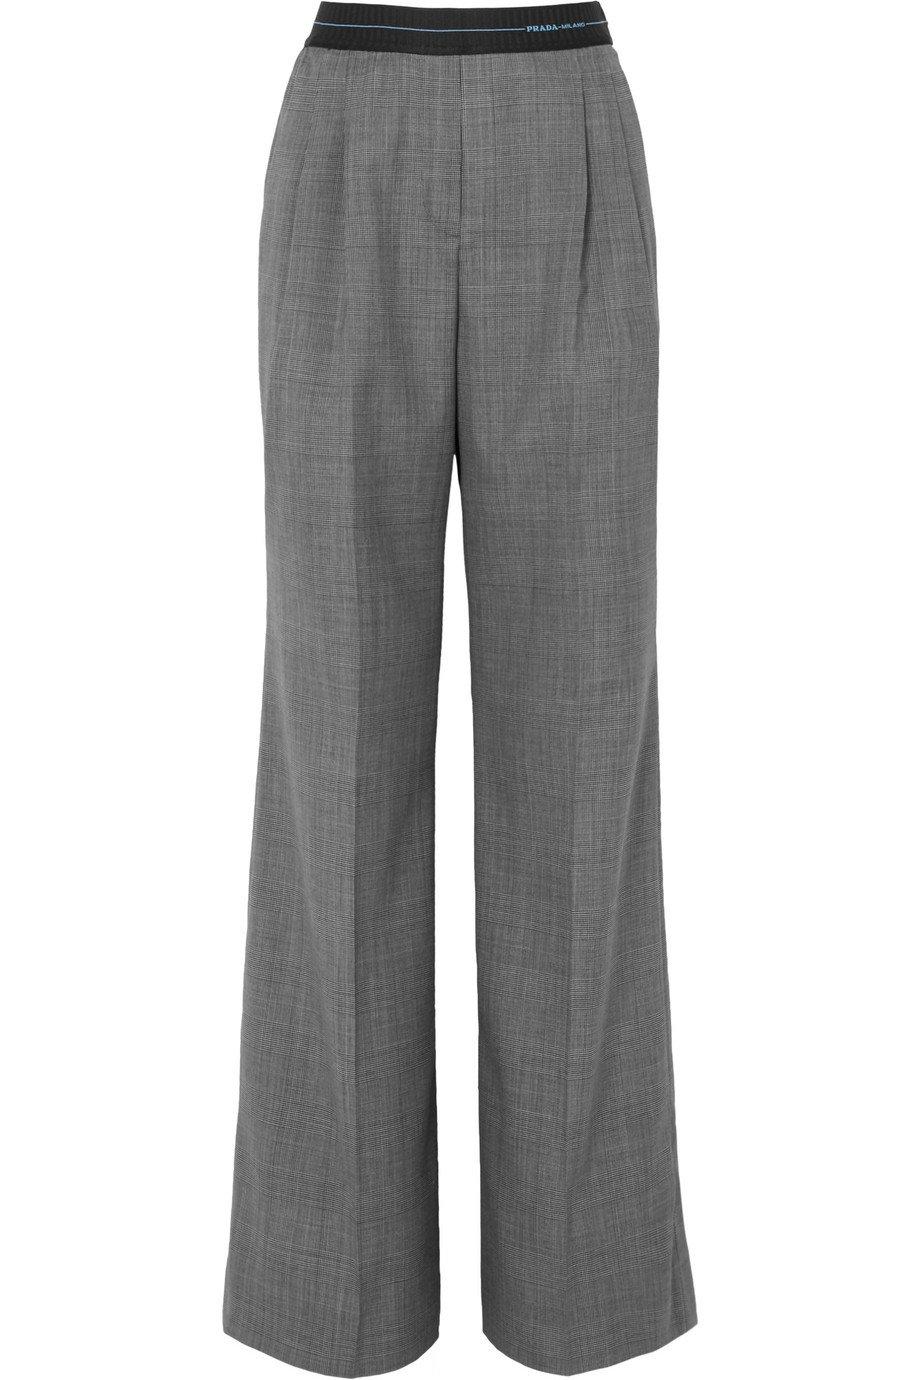 Prada | Checked wool wide-leg pants | NET-A-PORTER.COM